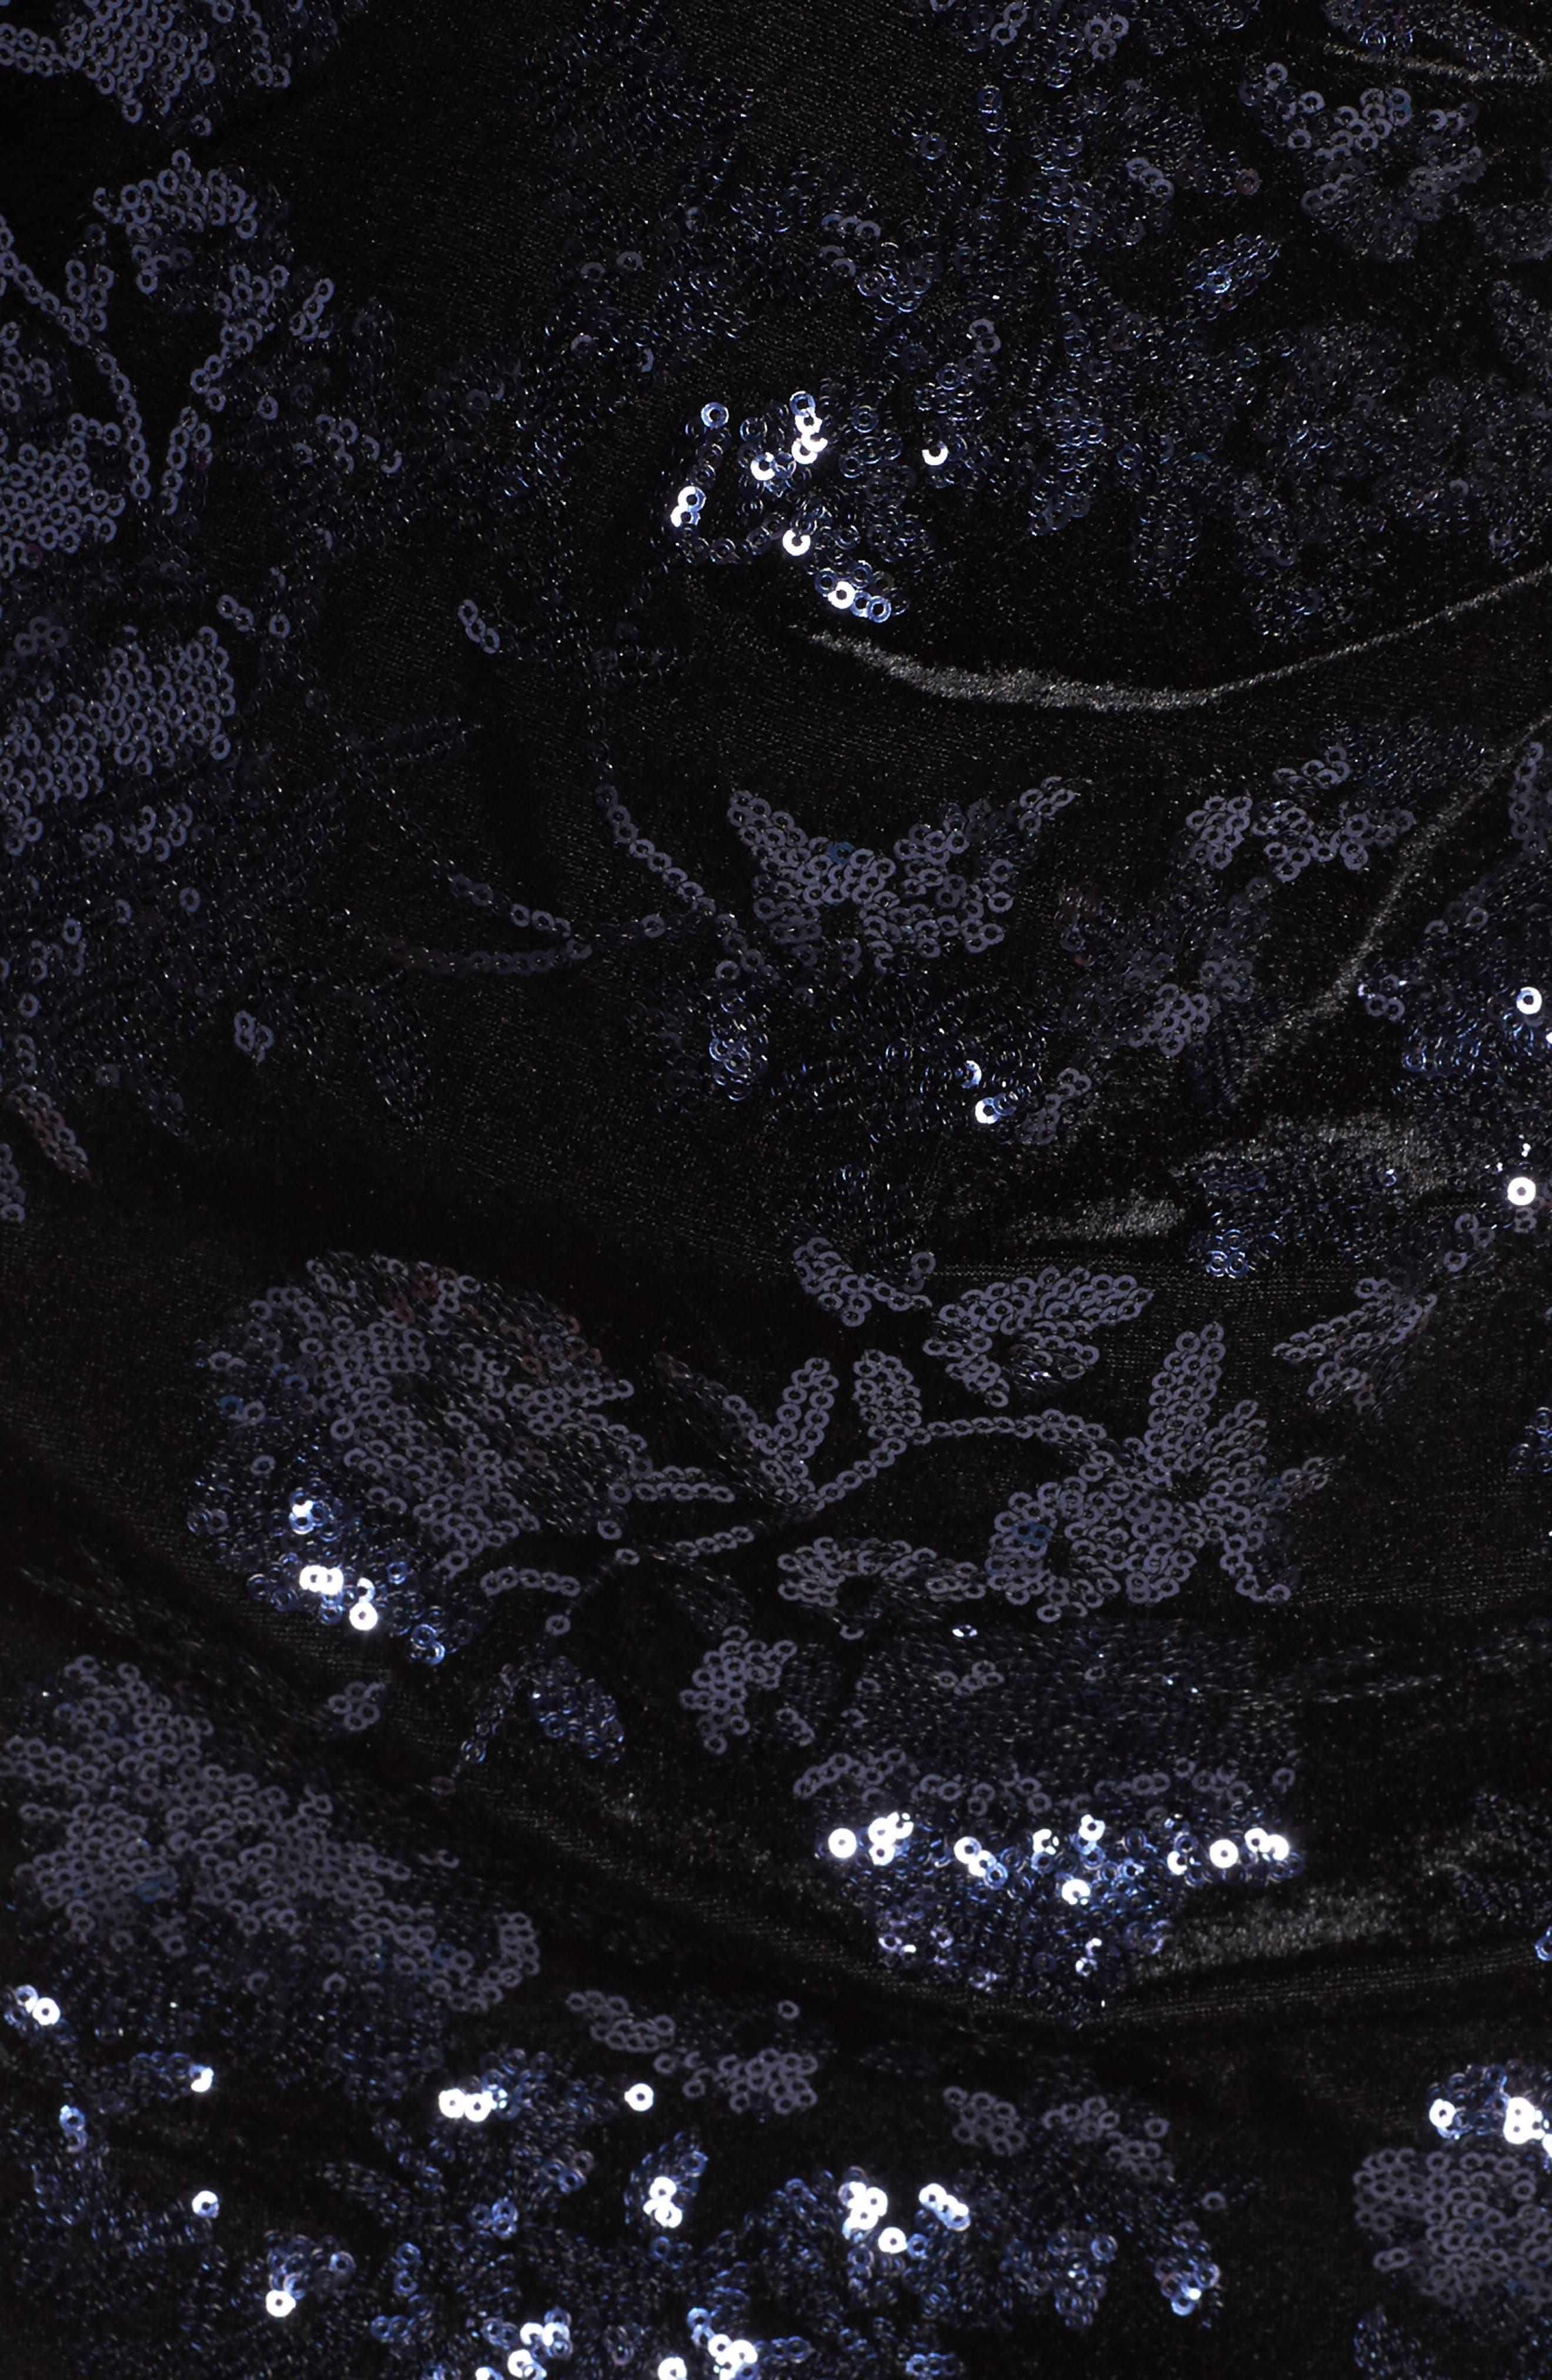 Sequin Embellished Sheath Dress,                             Alternate thumbnail 5, color,                             001